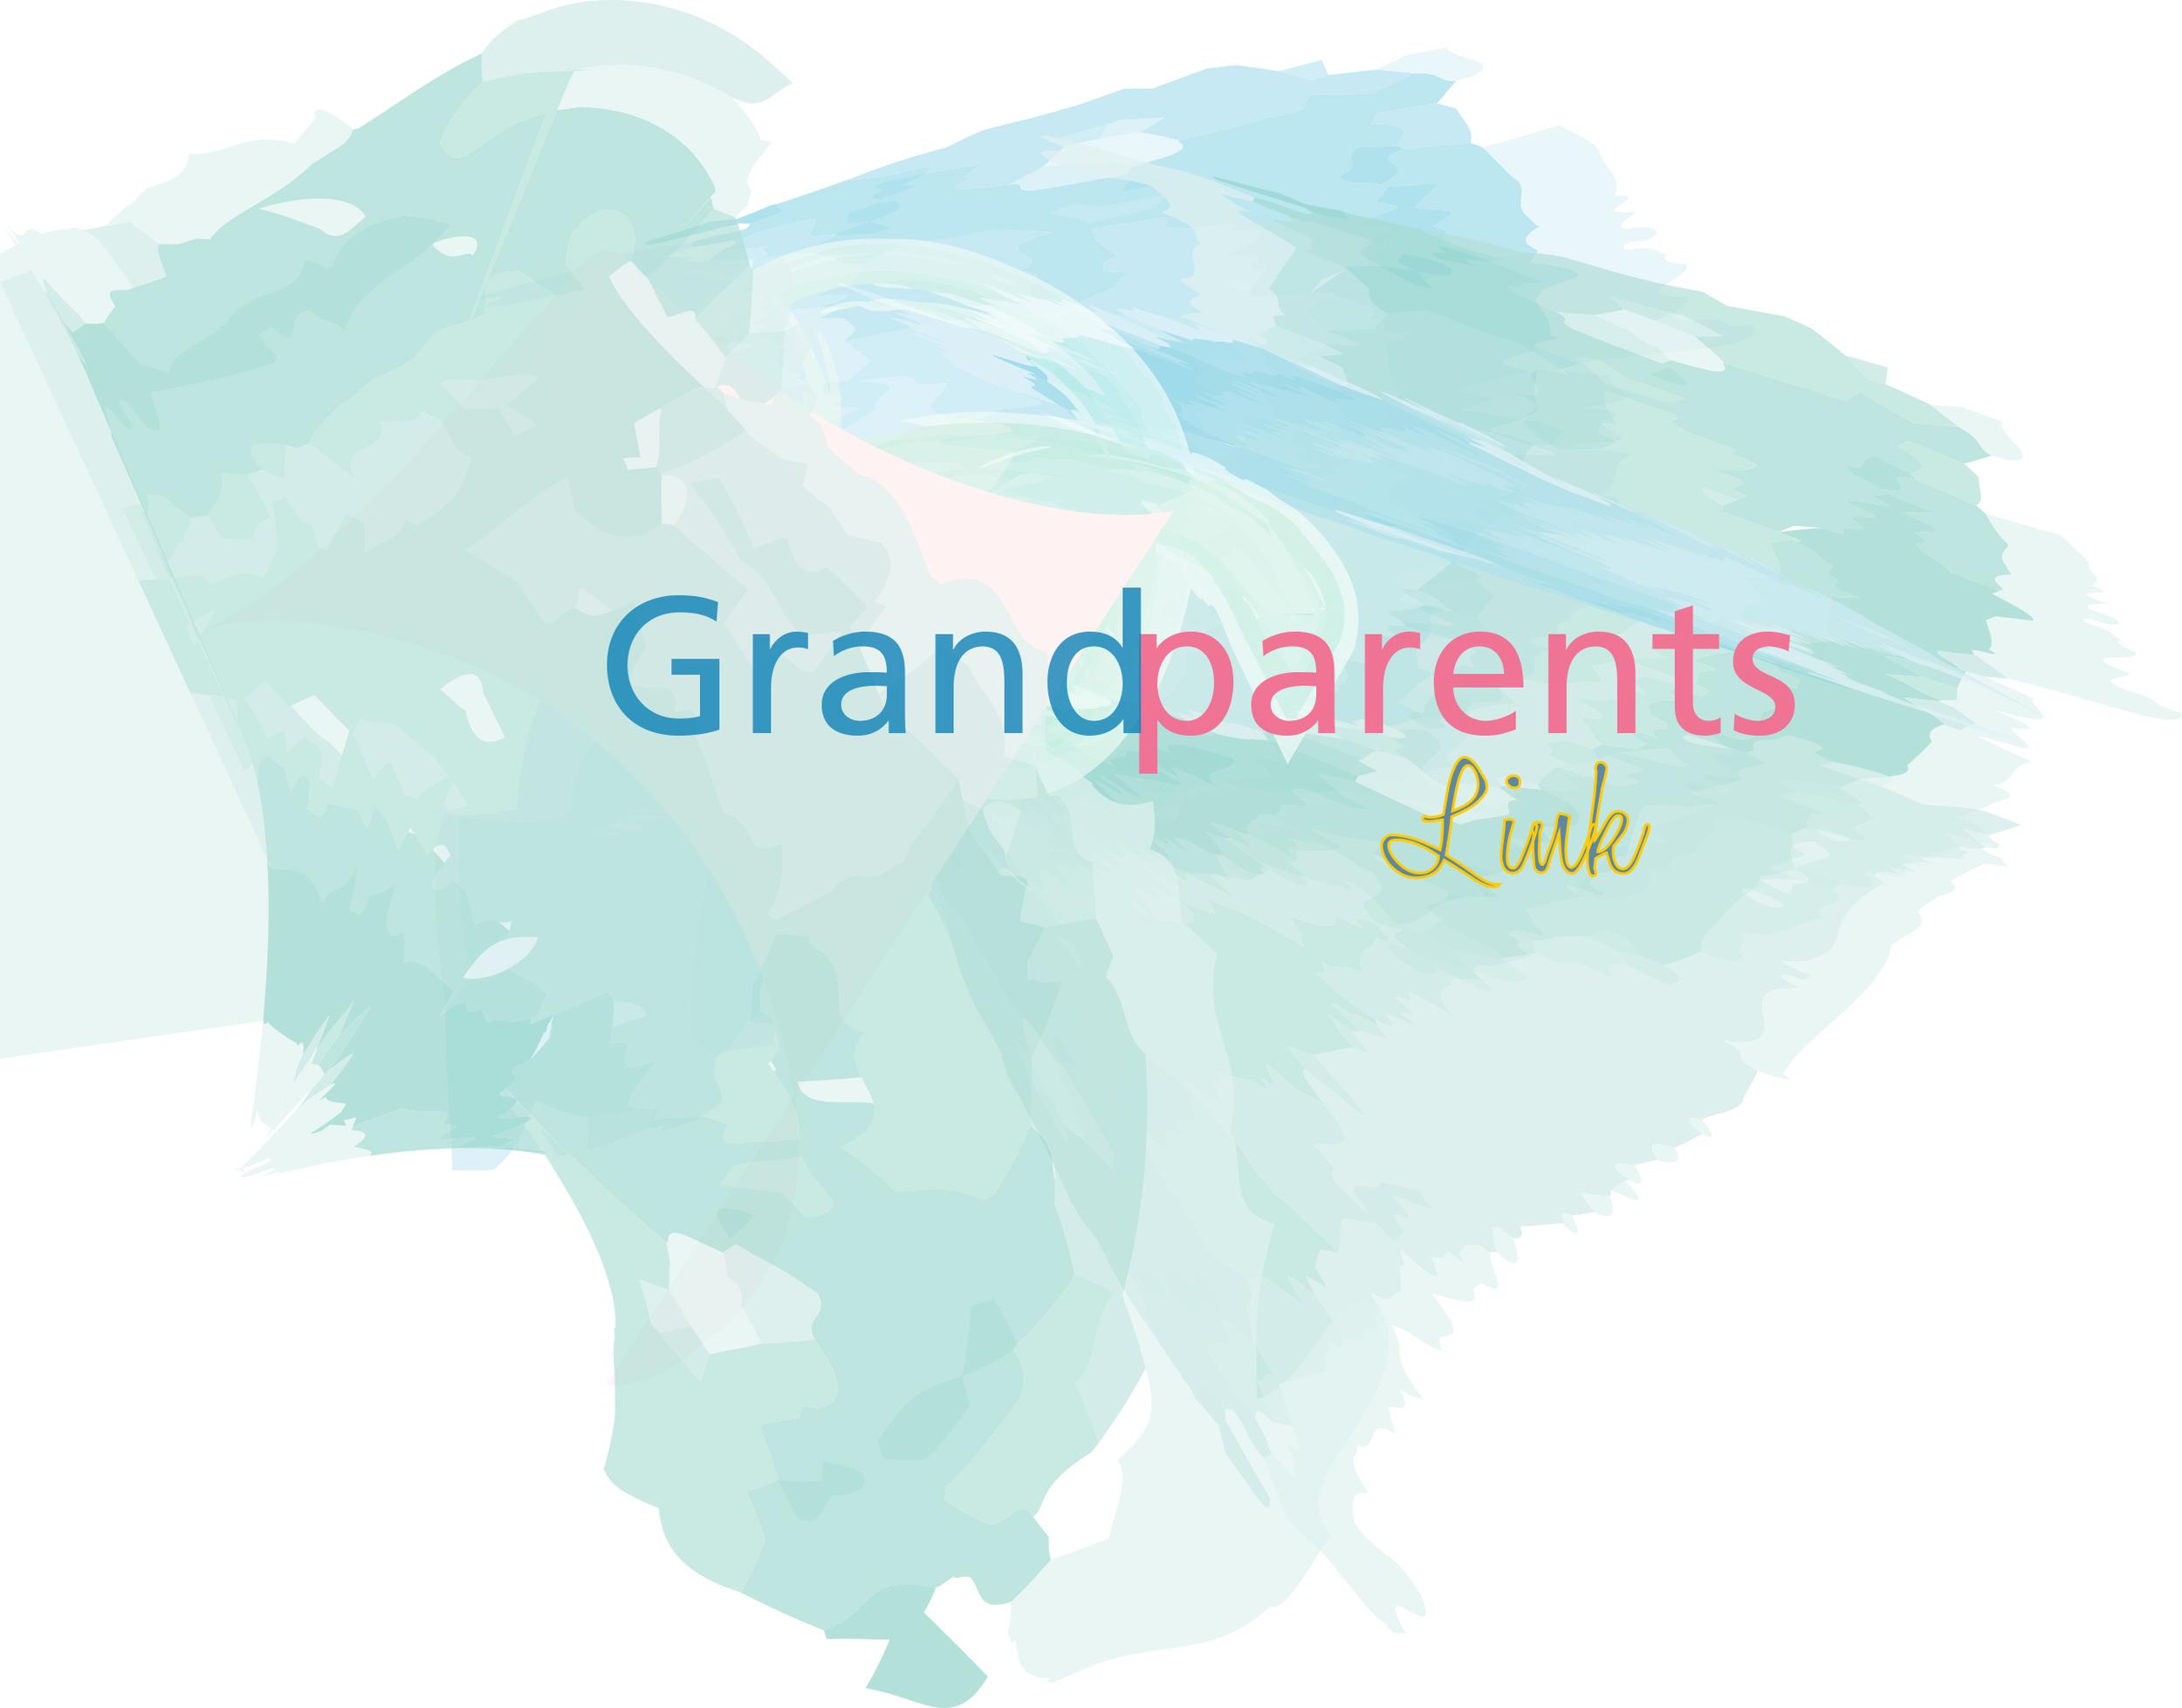 Grandparents Link